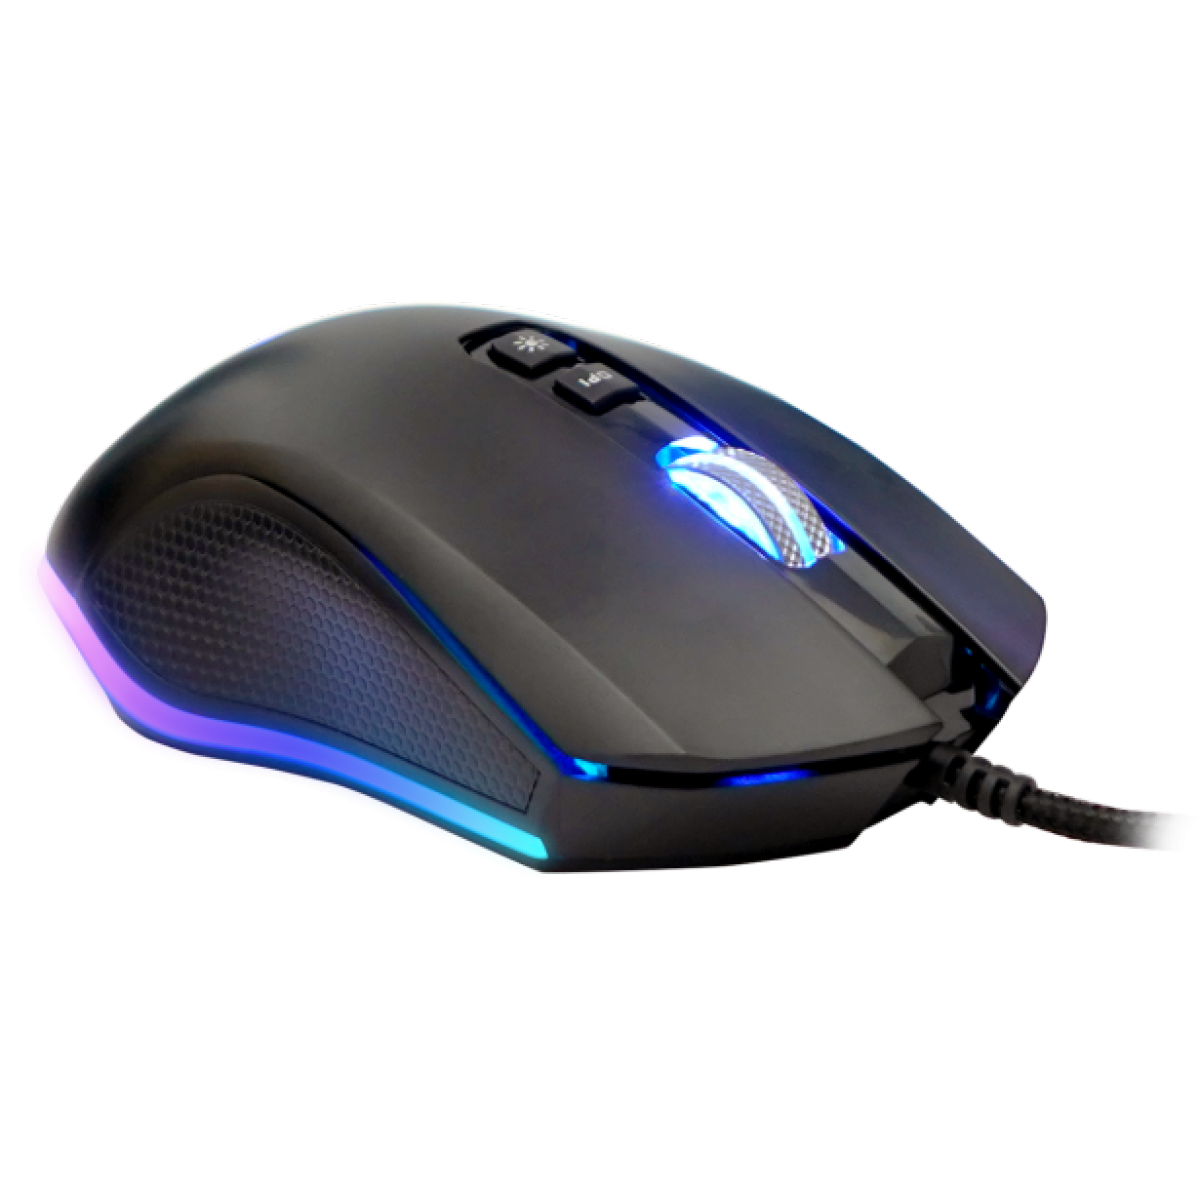 Mouse Gamer Fantech Zeus X5s, 4.800 DPI, 7 Botões, RGB, Black